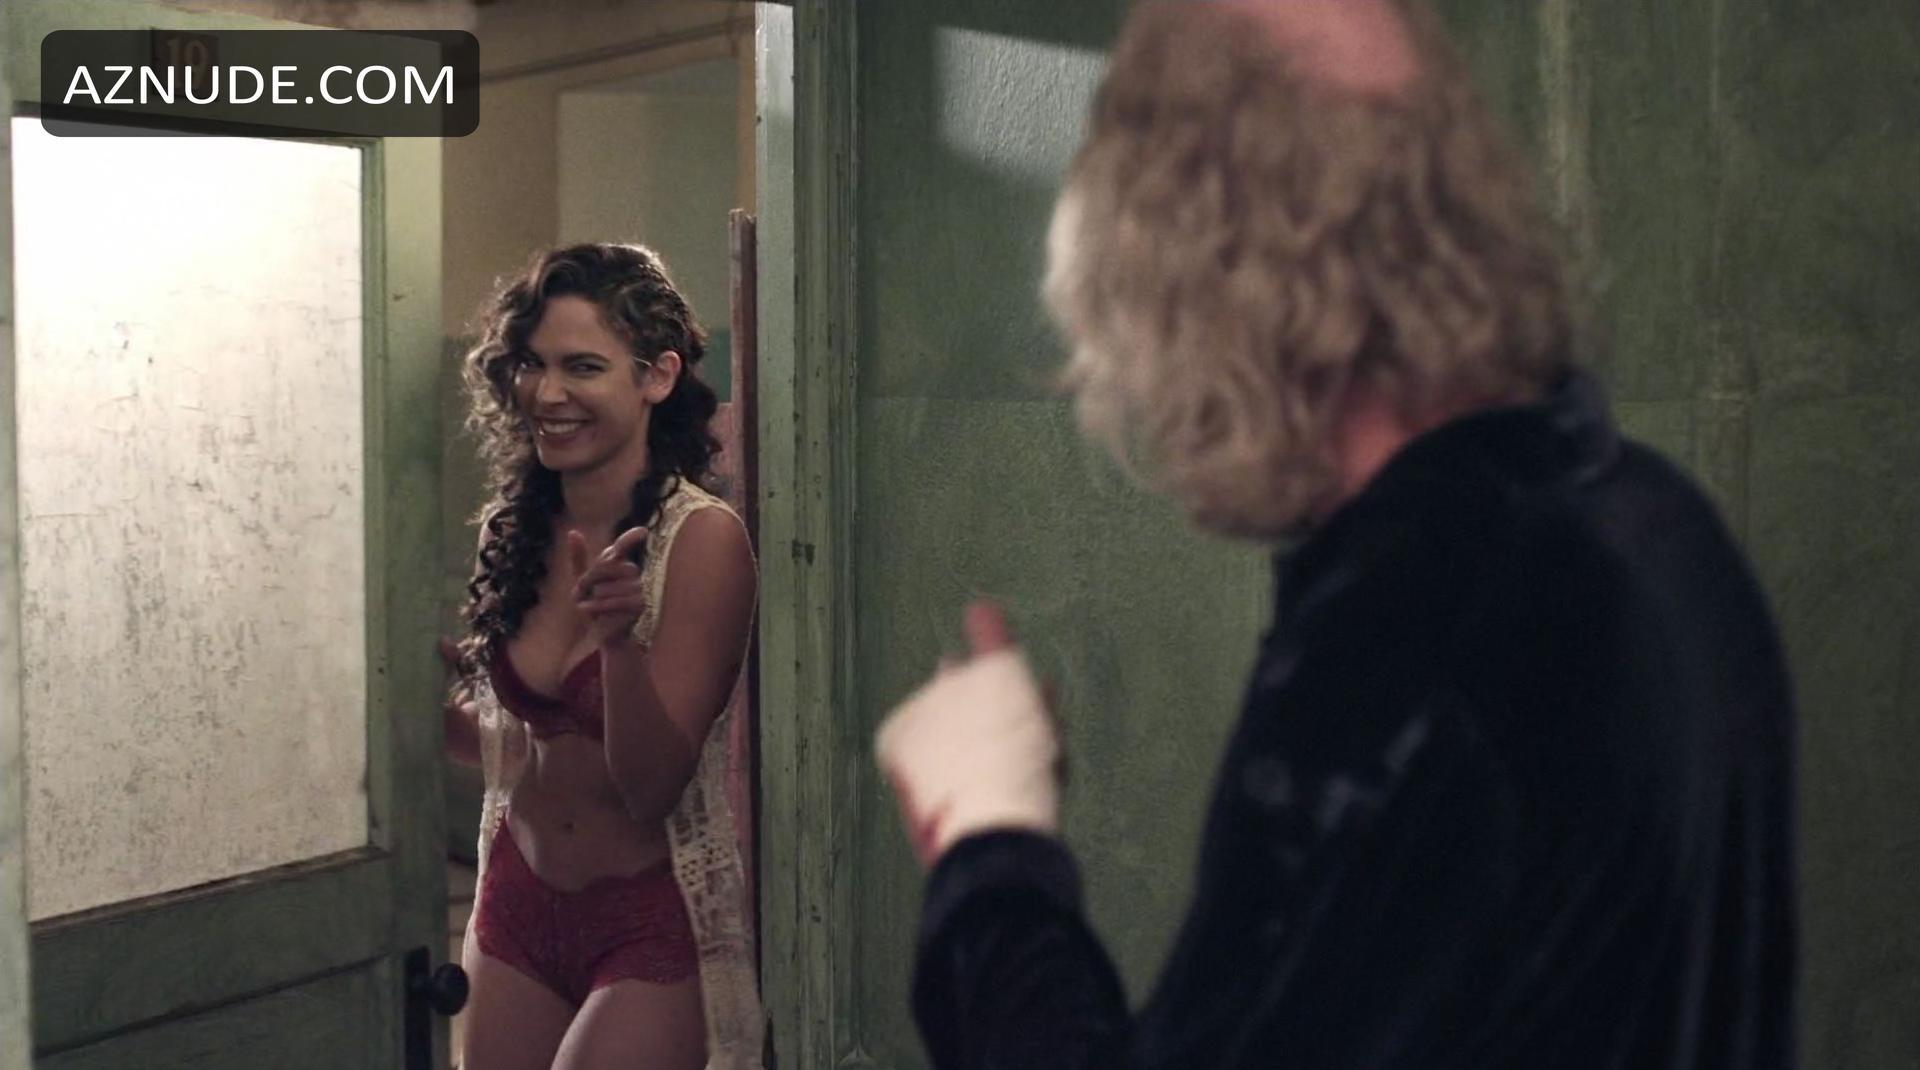 Anastasia Baranova Naked z nation nude scenes - aznude